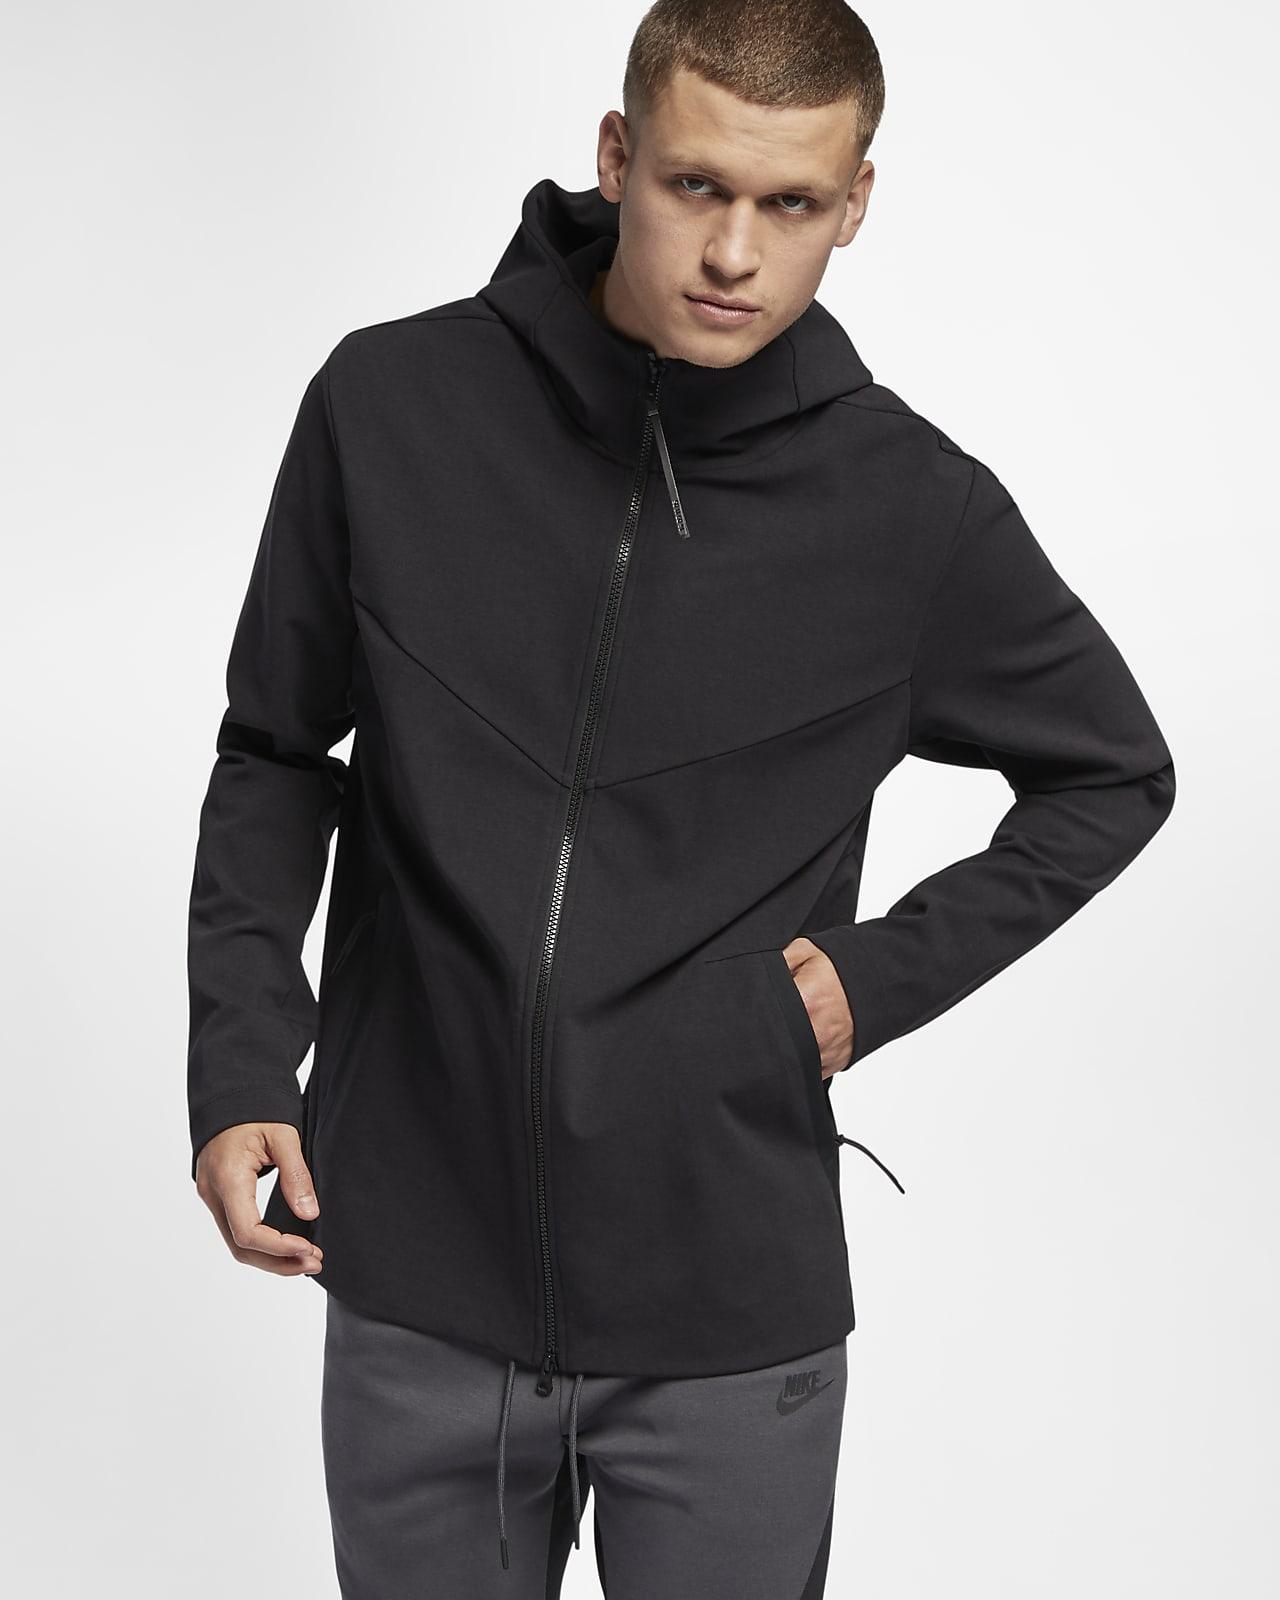 Intentar hoja sensación  Nike Sportswear Tech Pack Men's Full-Zip Knit Hoodie. Nike SA